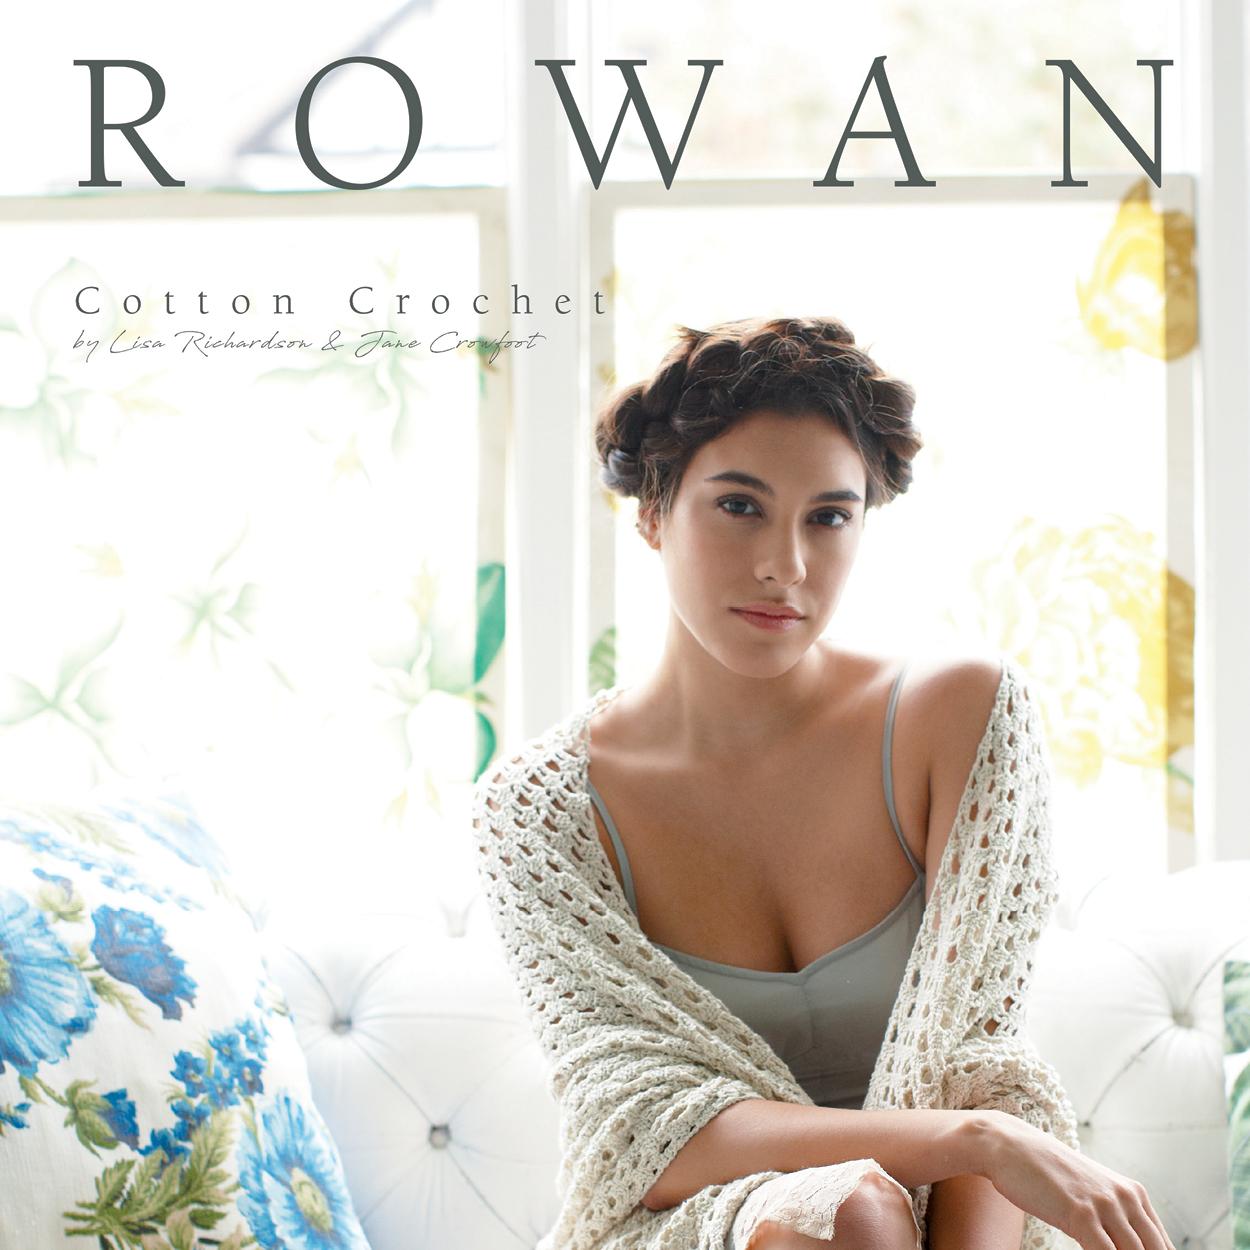 Rowan Cotton Crochet